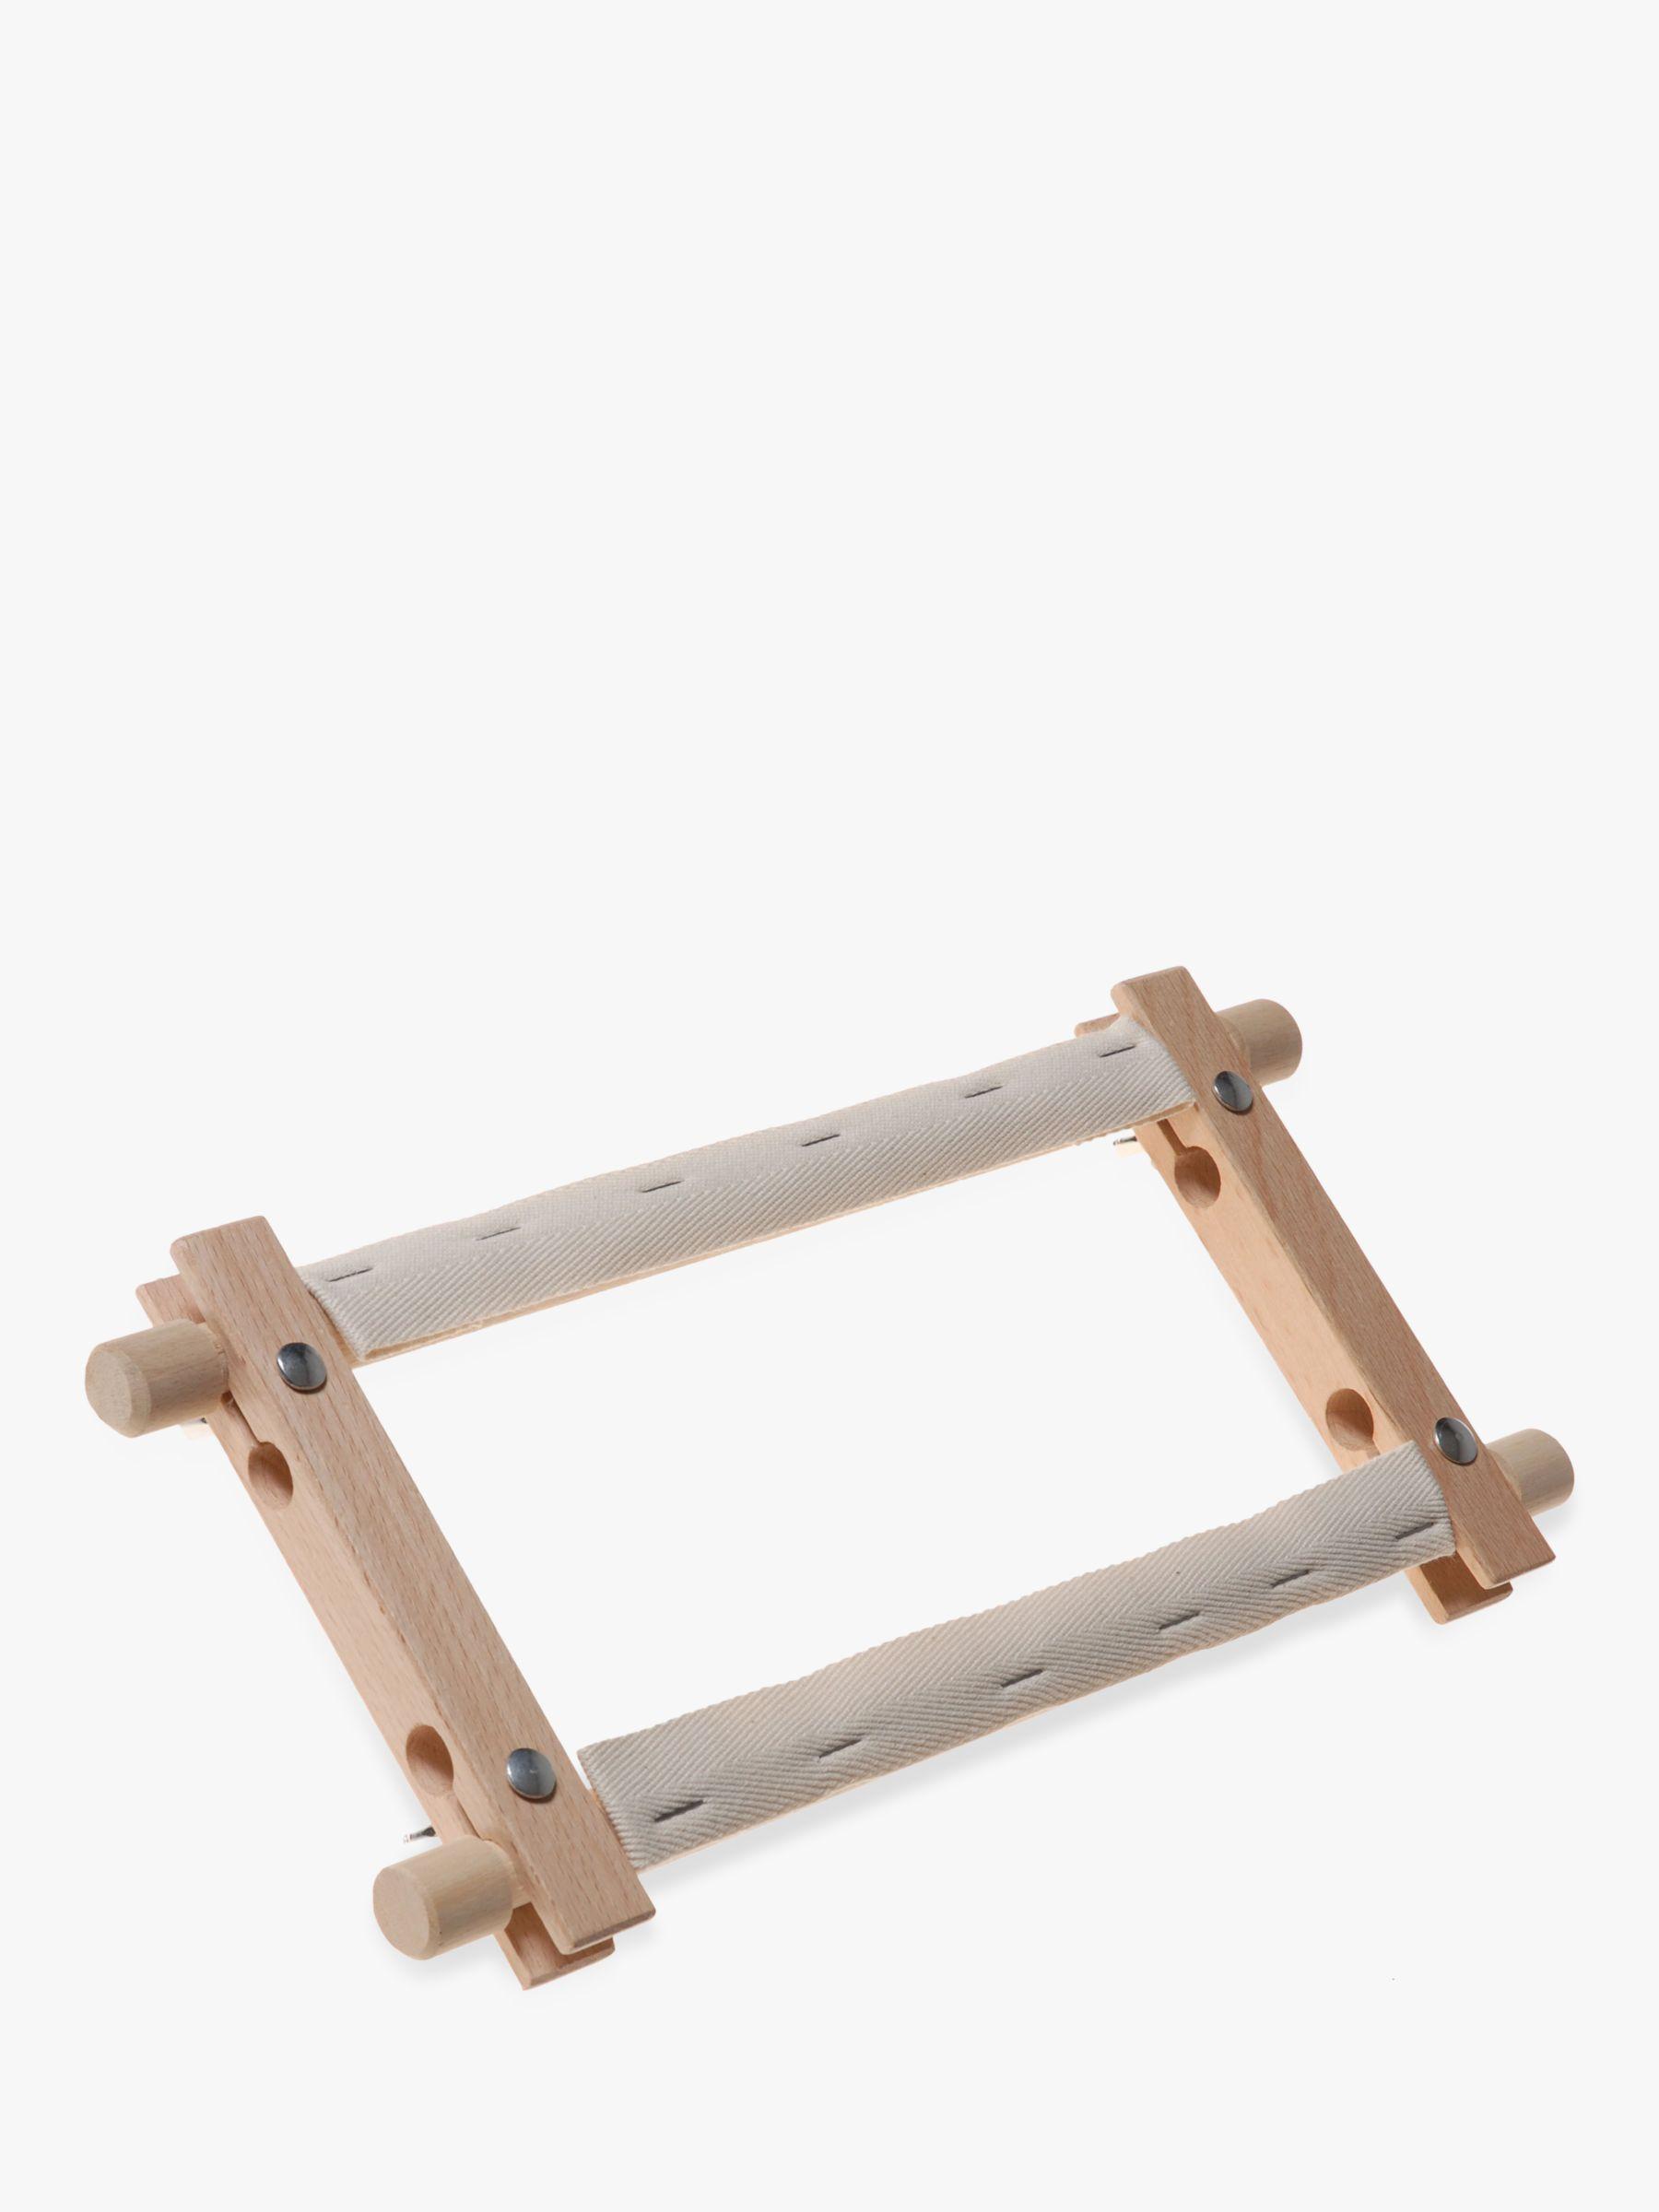 Elbesee Elbesee Hand Rotating Frame, 30.5 x 23cm